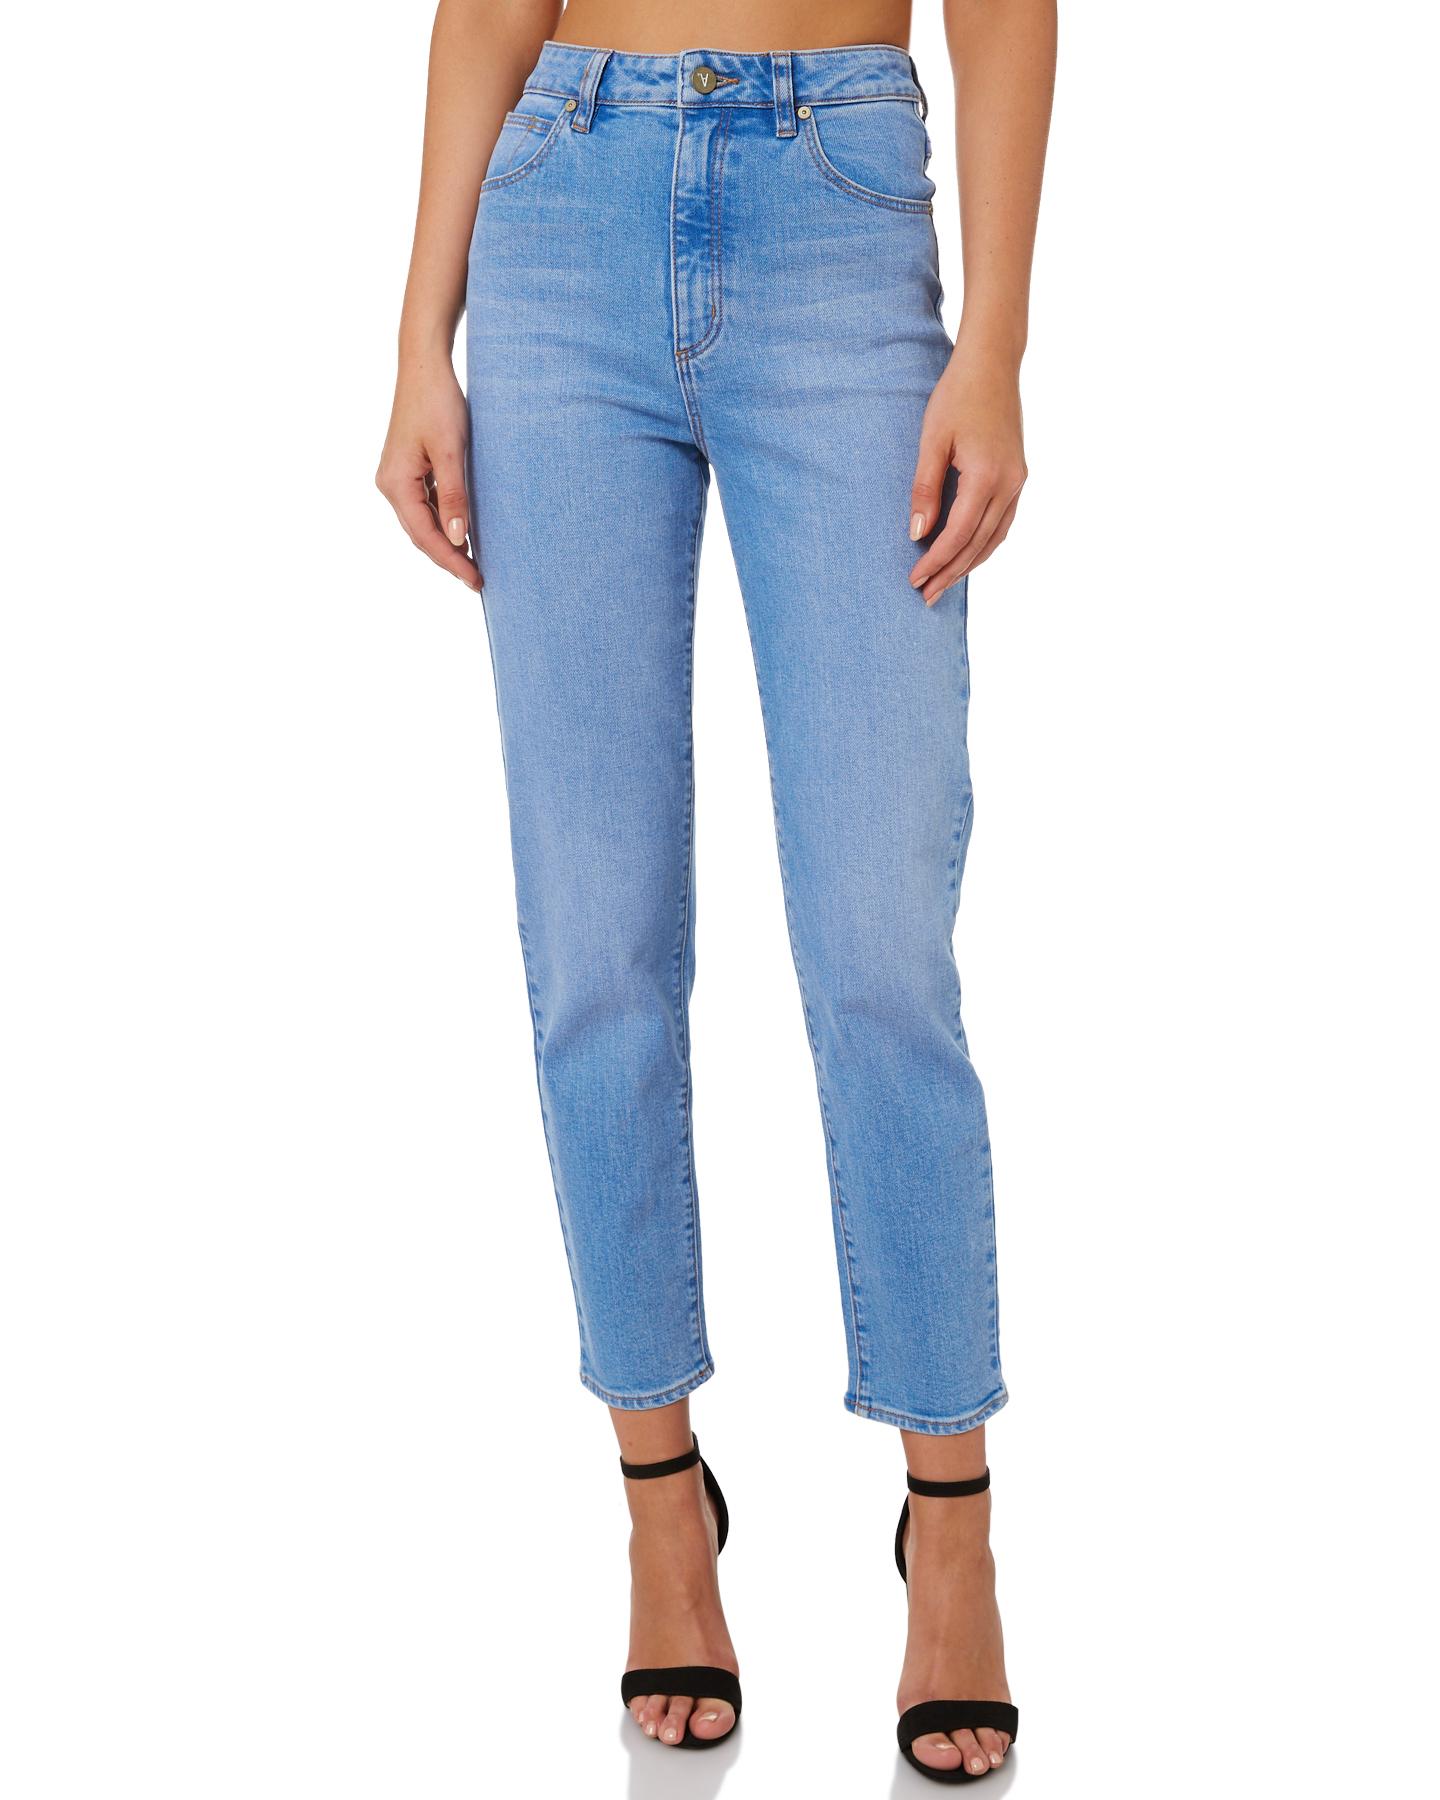 Image of A.Brand A 94 High Slim Jean Georgia Georgia